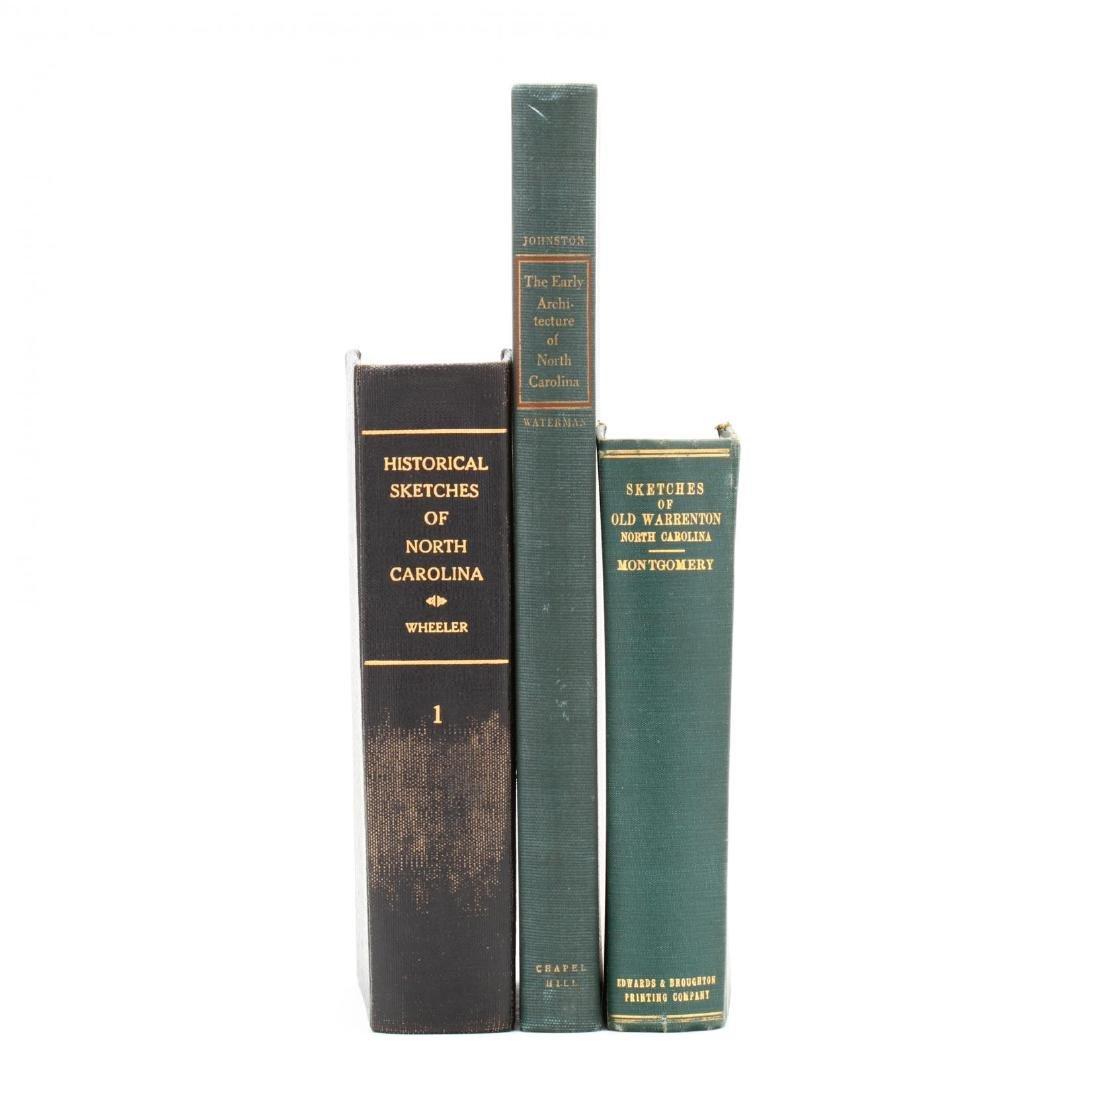 Three Books Related to the History of North Carolina